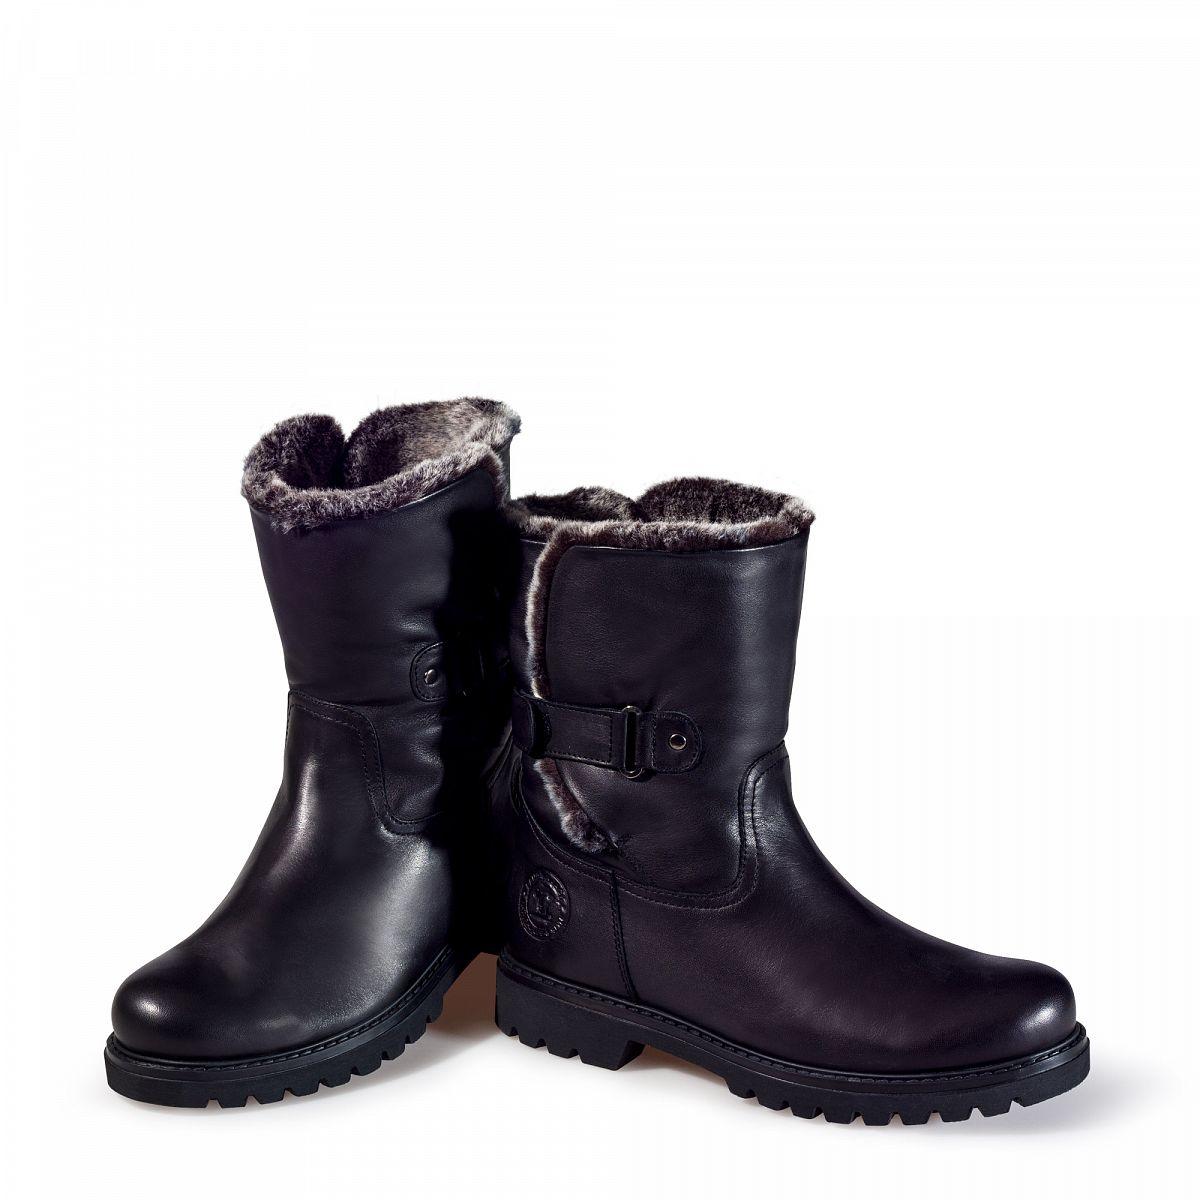 women 39 s boots felia black panama jack official store. Black Bedroom Furniture Sets. Home Design Ideas